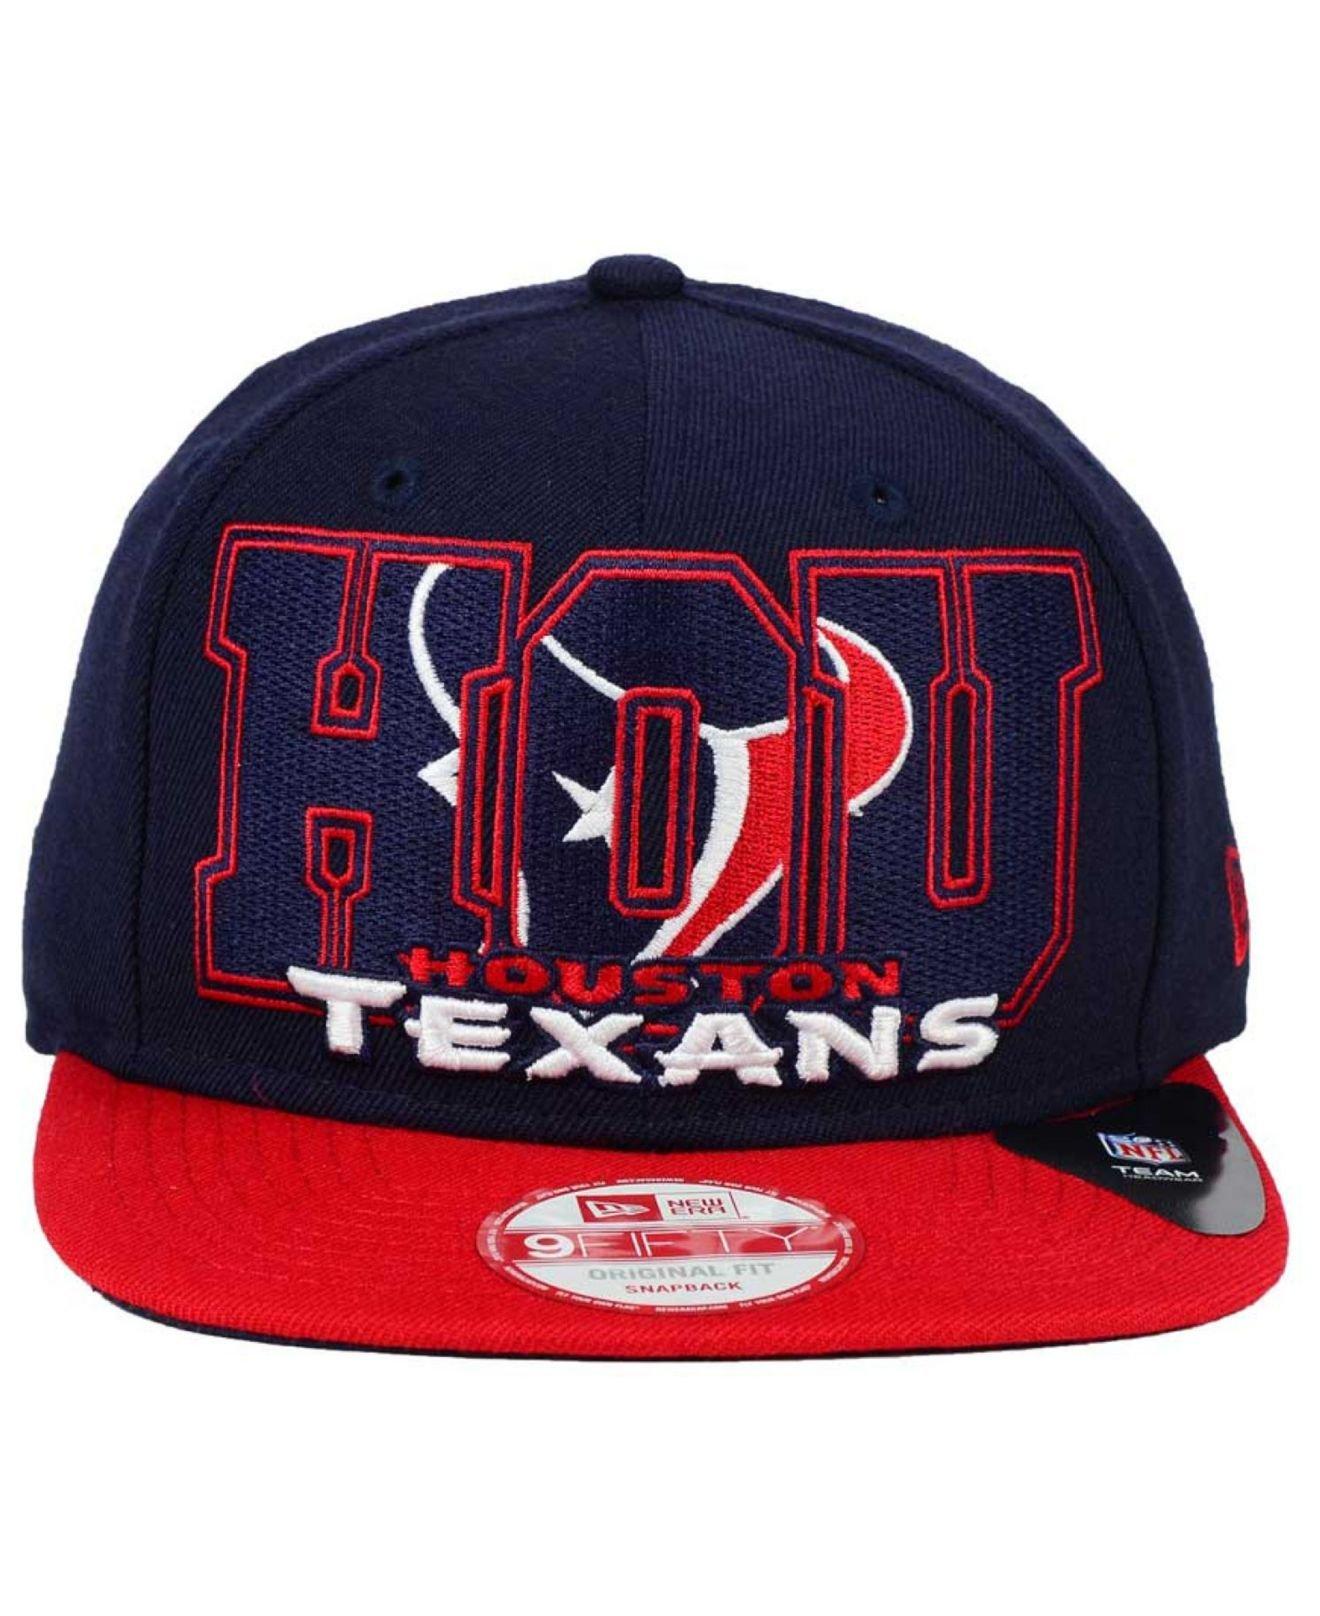 best website 6b822 8dc09 Lyst - Ktz Houston Texans Big City 9fifty Snapback Cap in Blue for Men